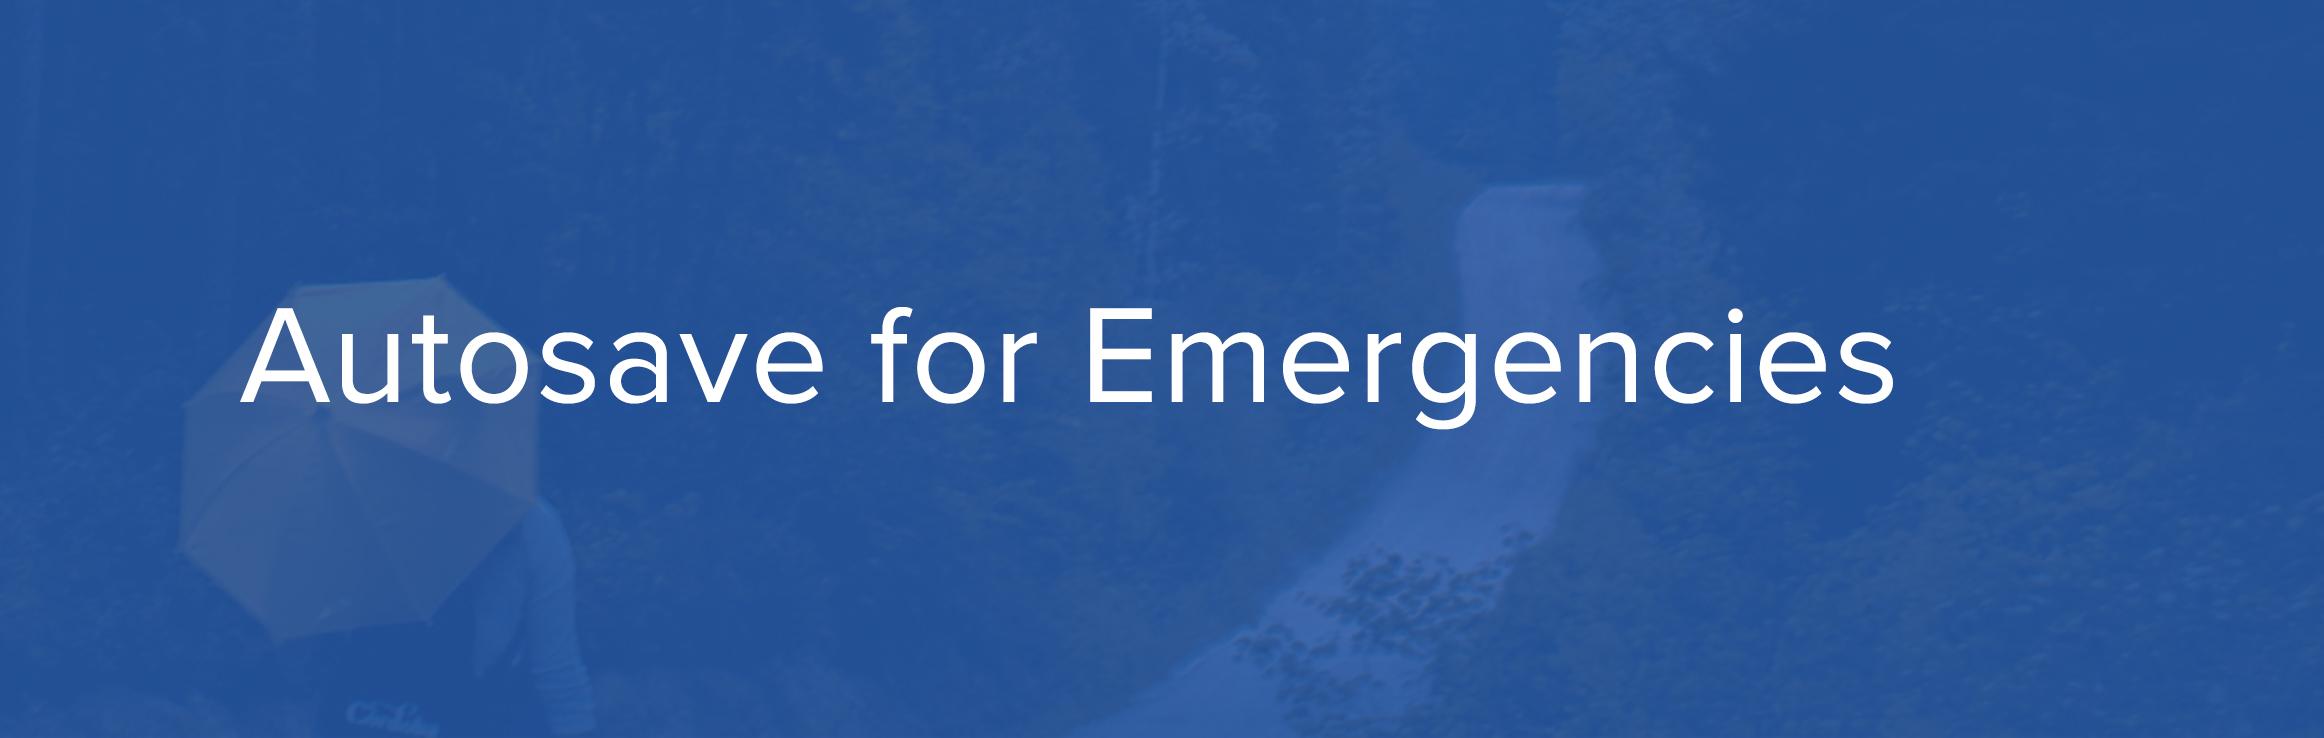 autosave for emergencies